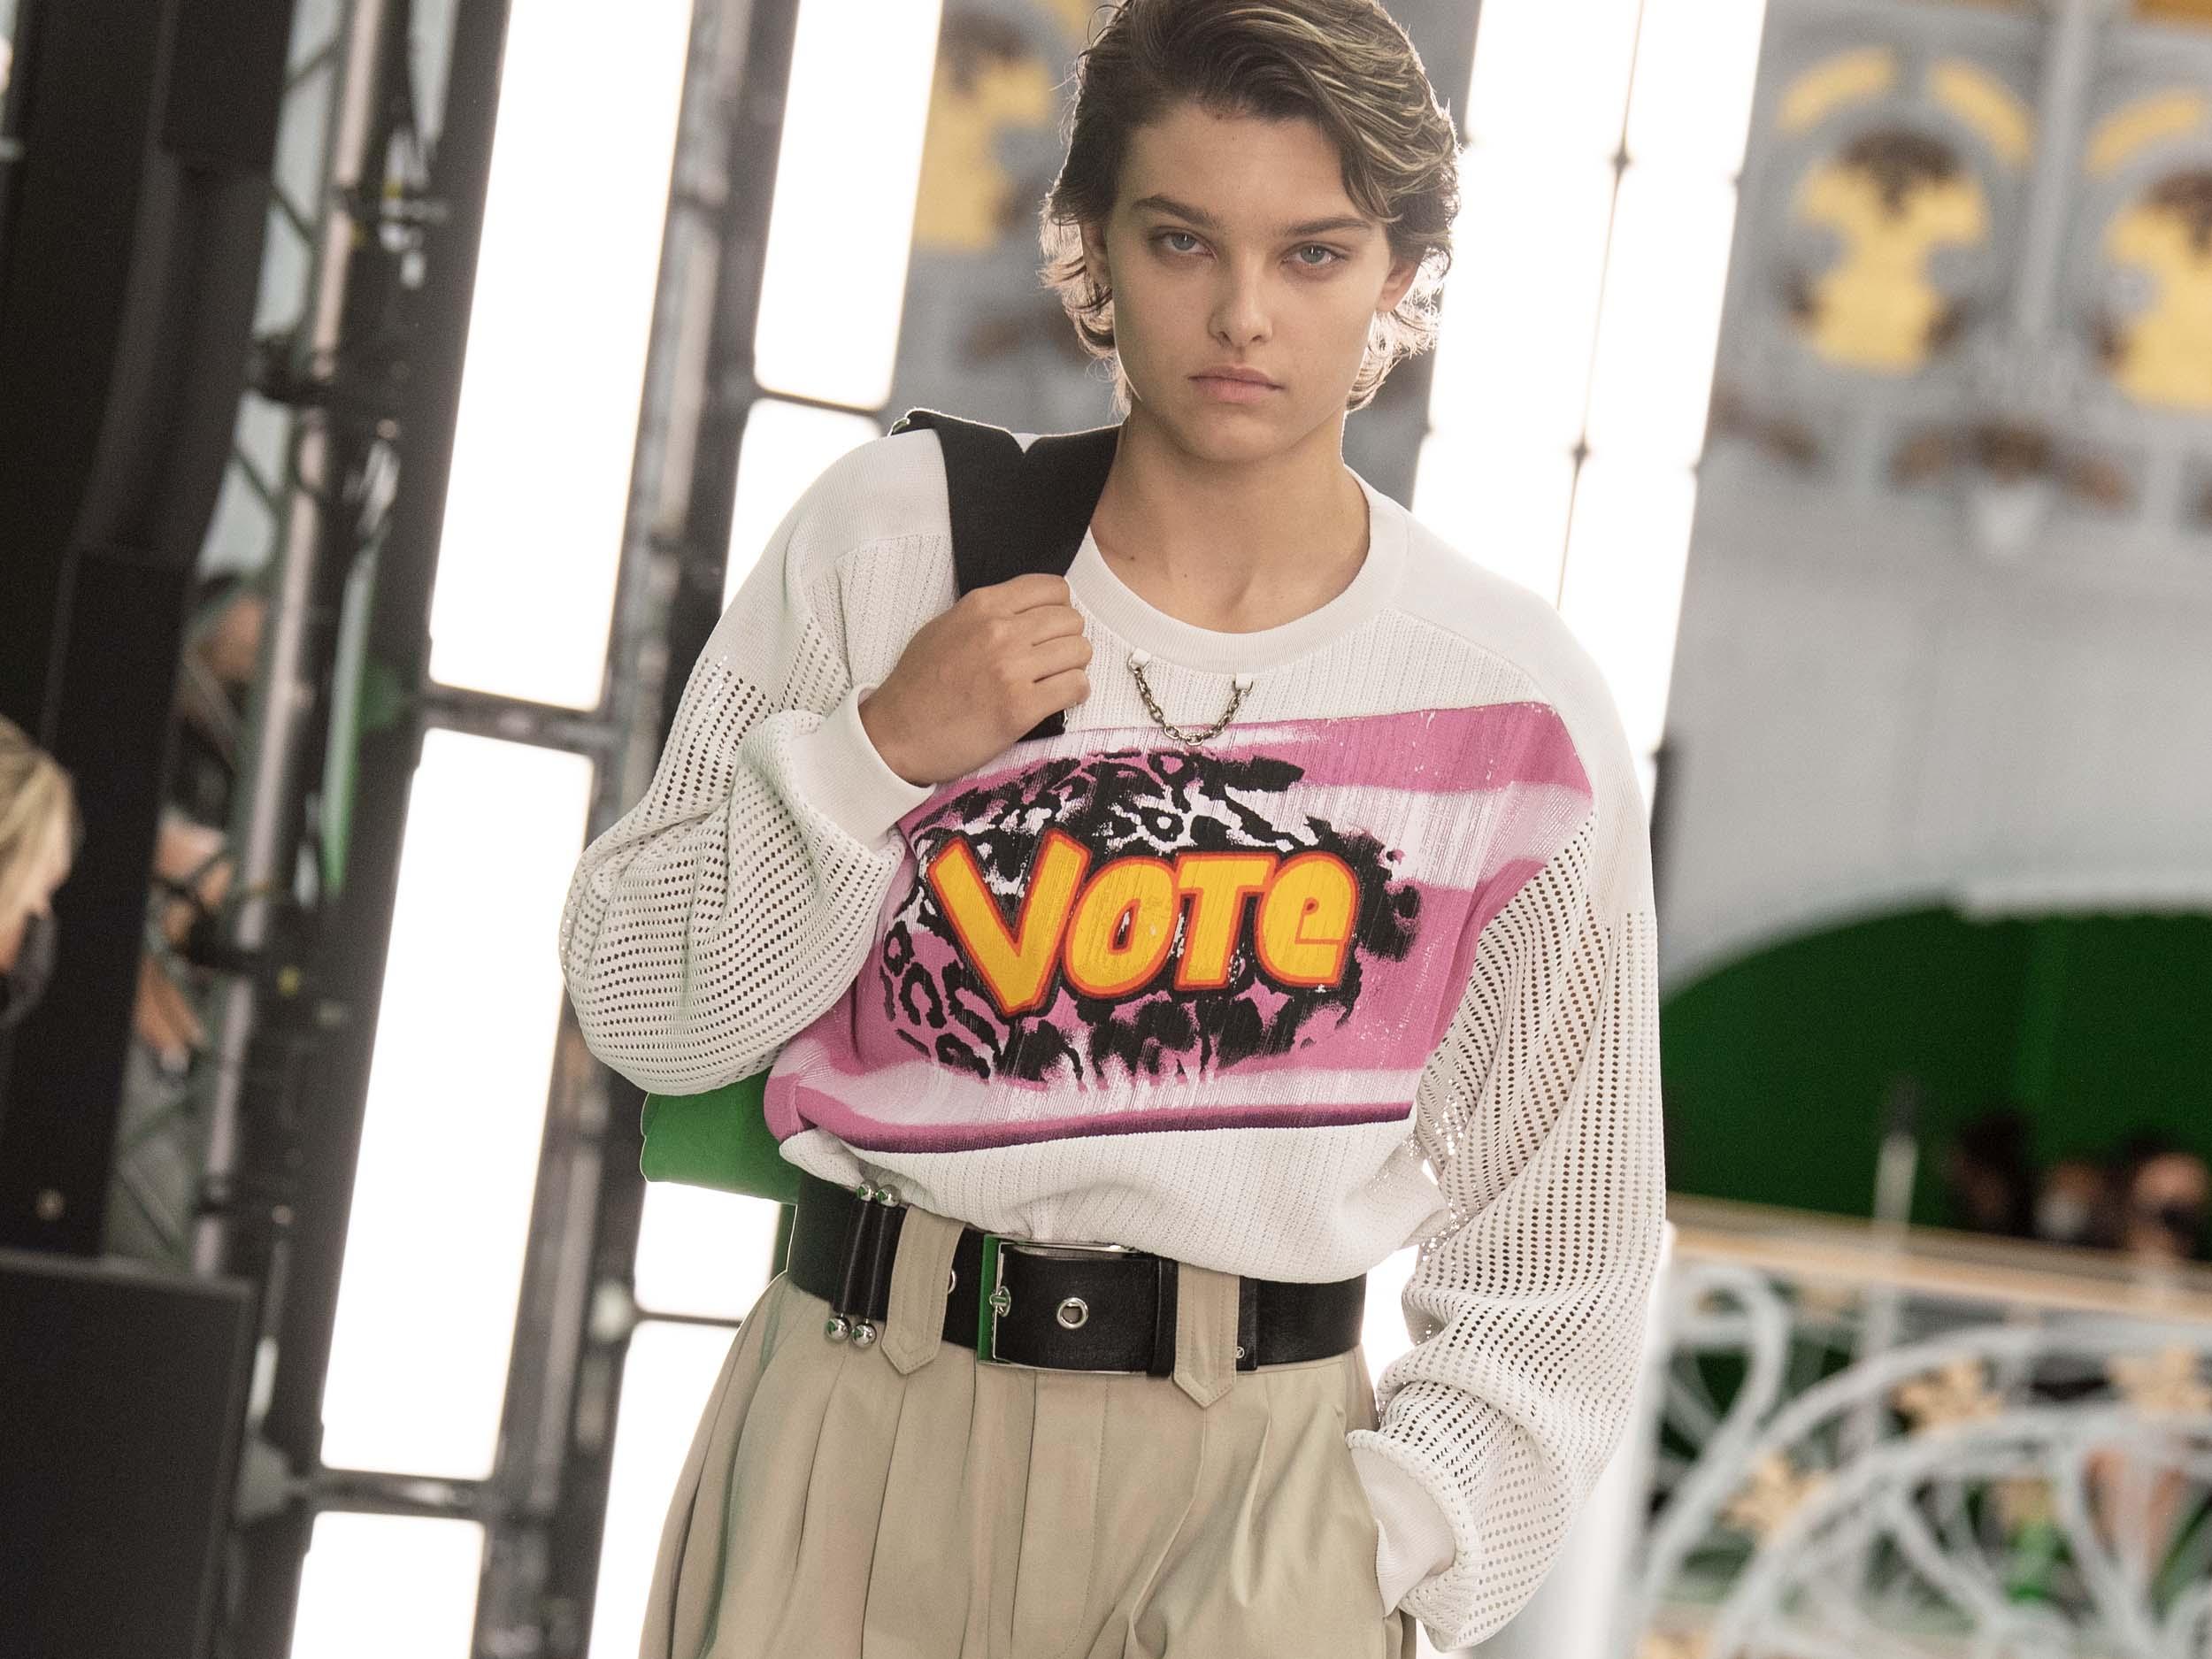 Louis Vuitton's Spring/Summer 2021 collection endorses androgyny